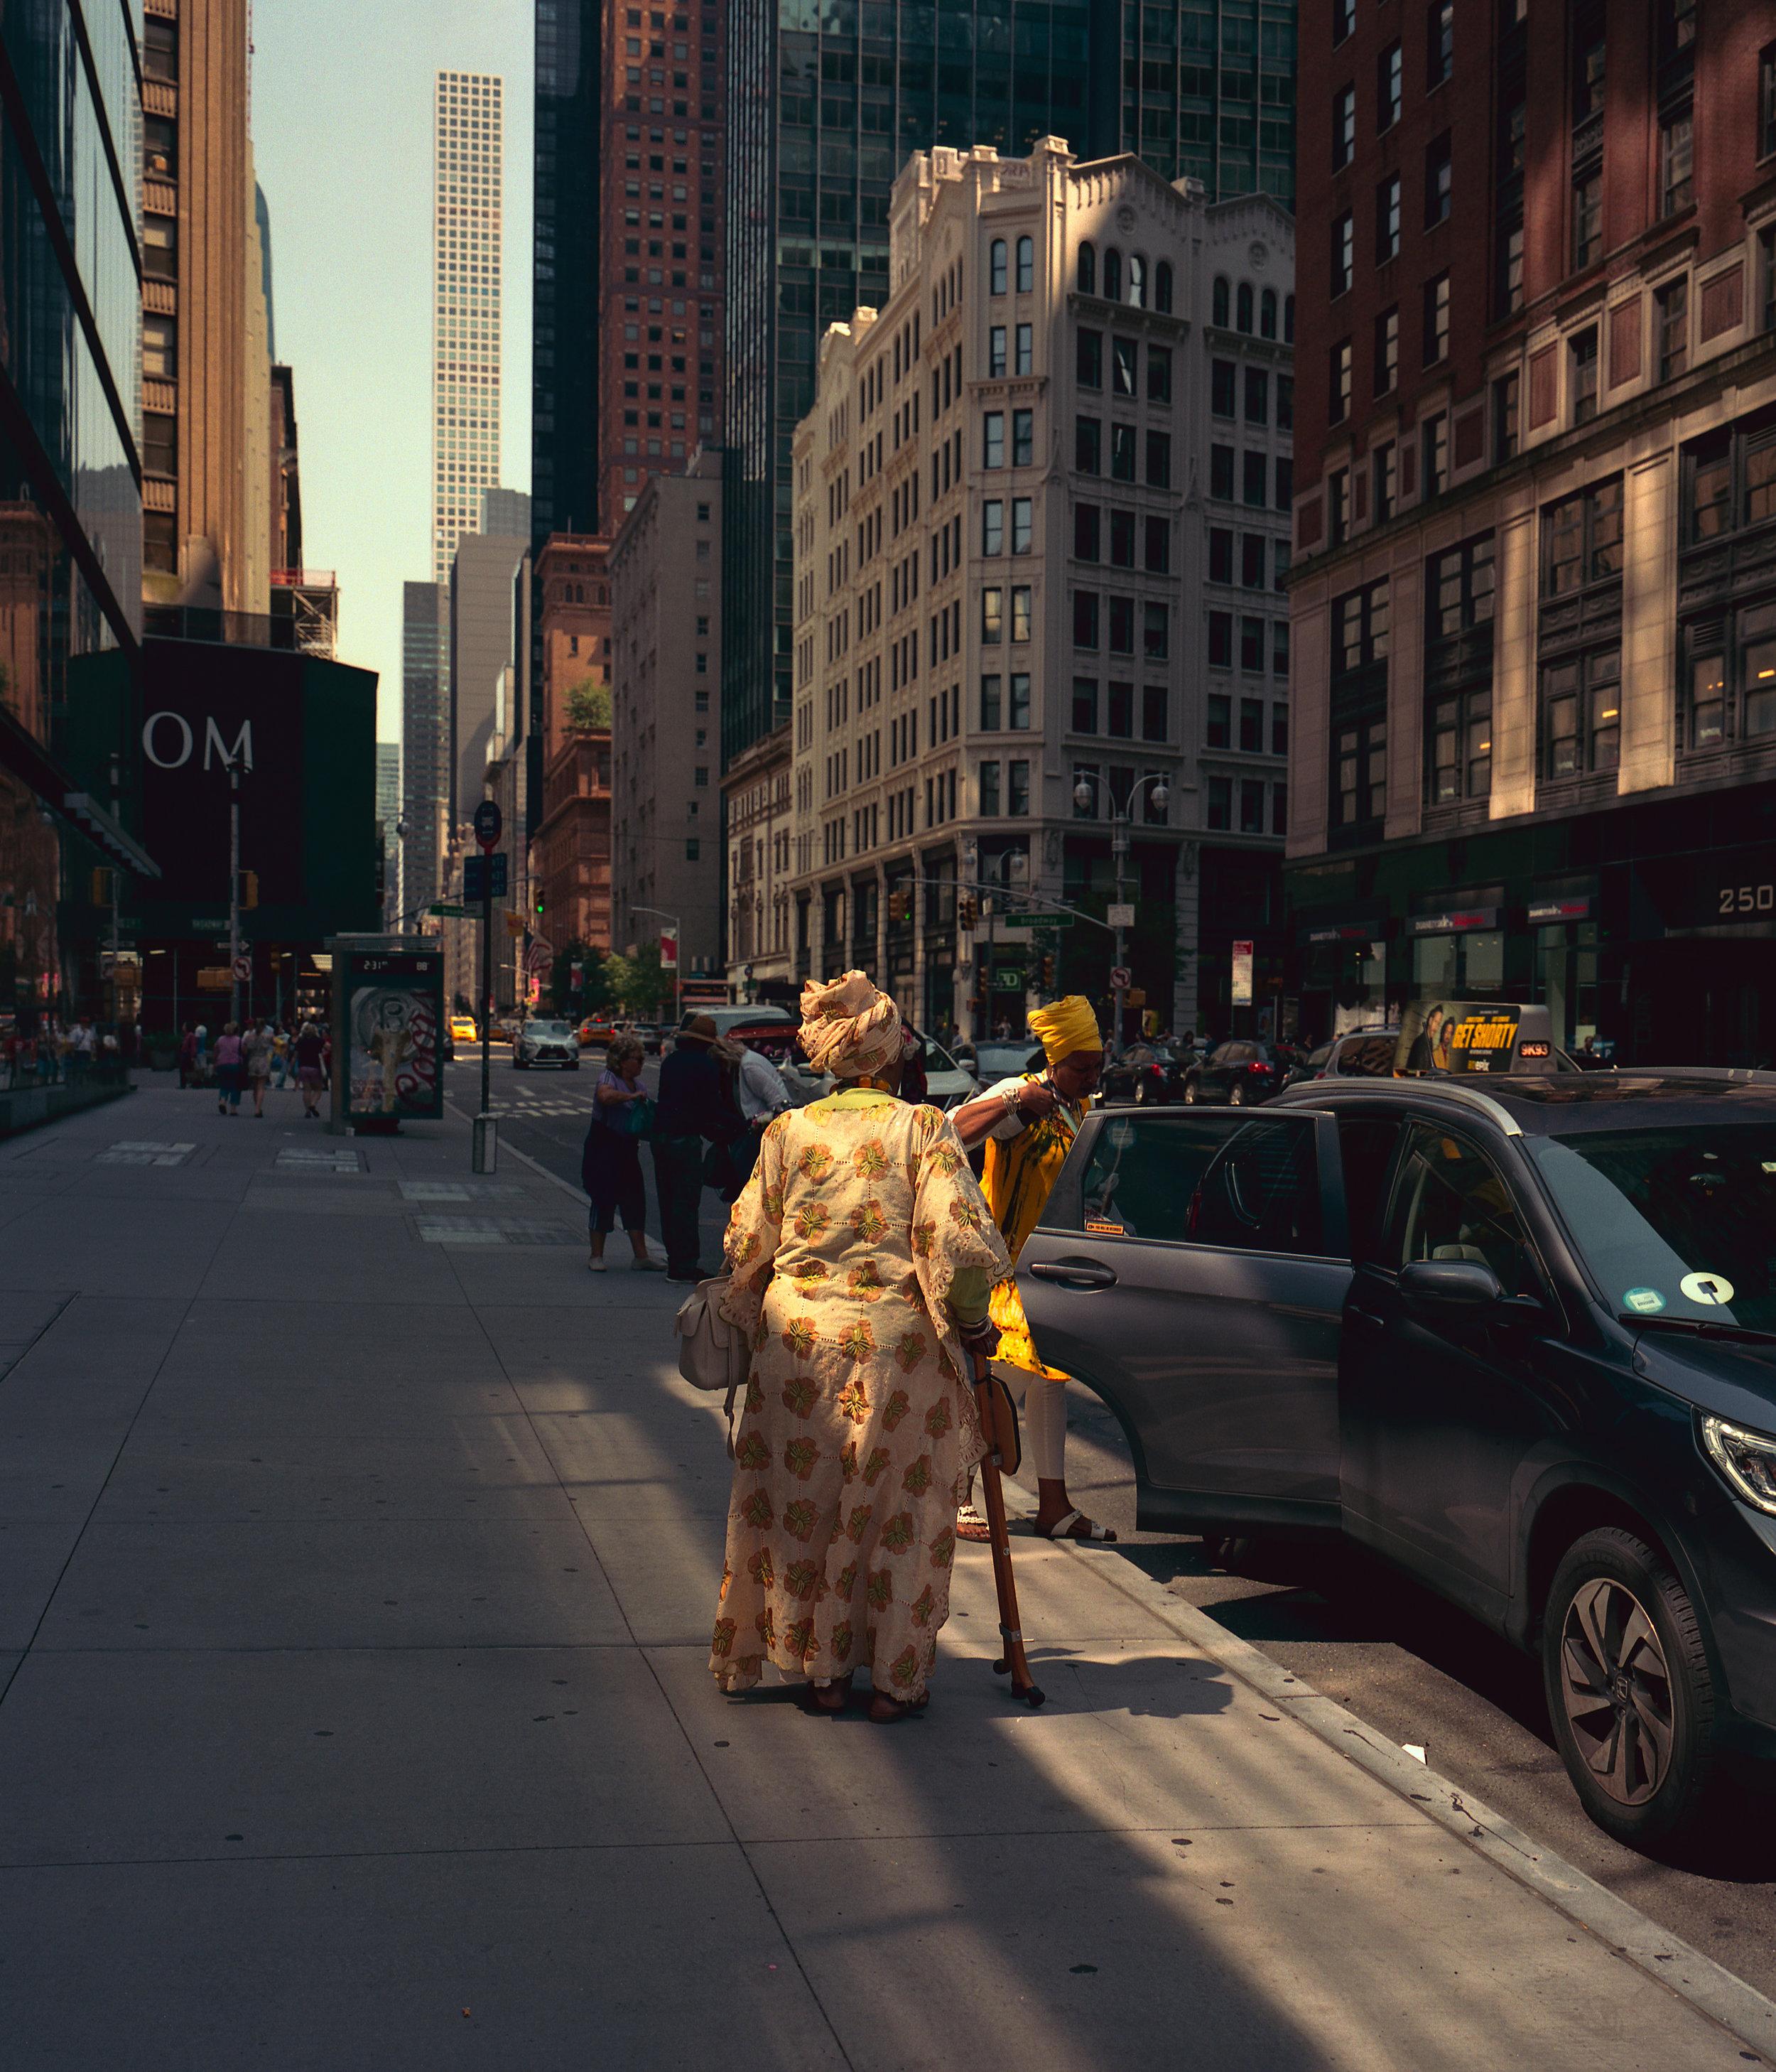 New York City #1